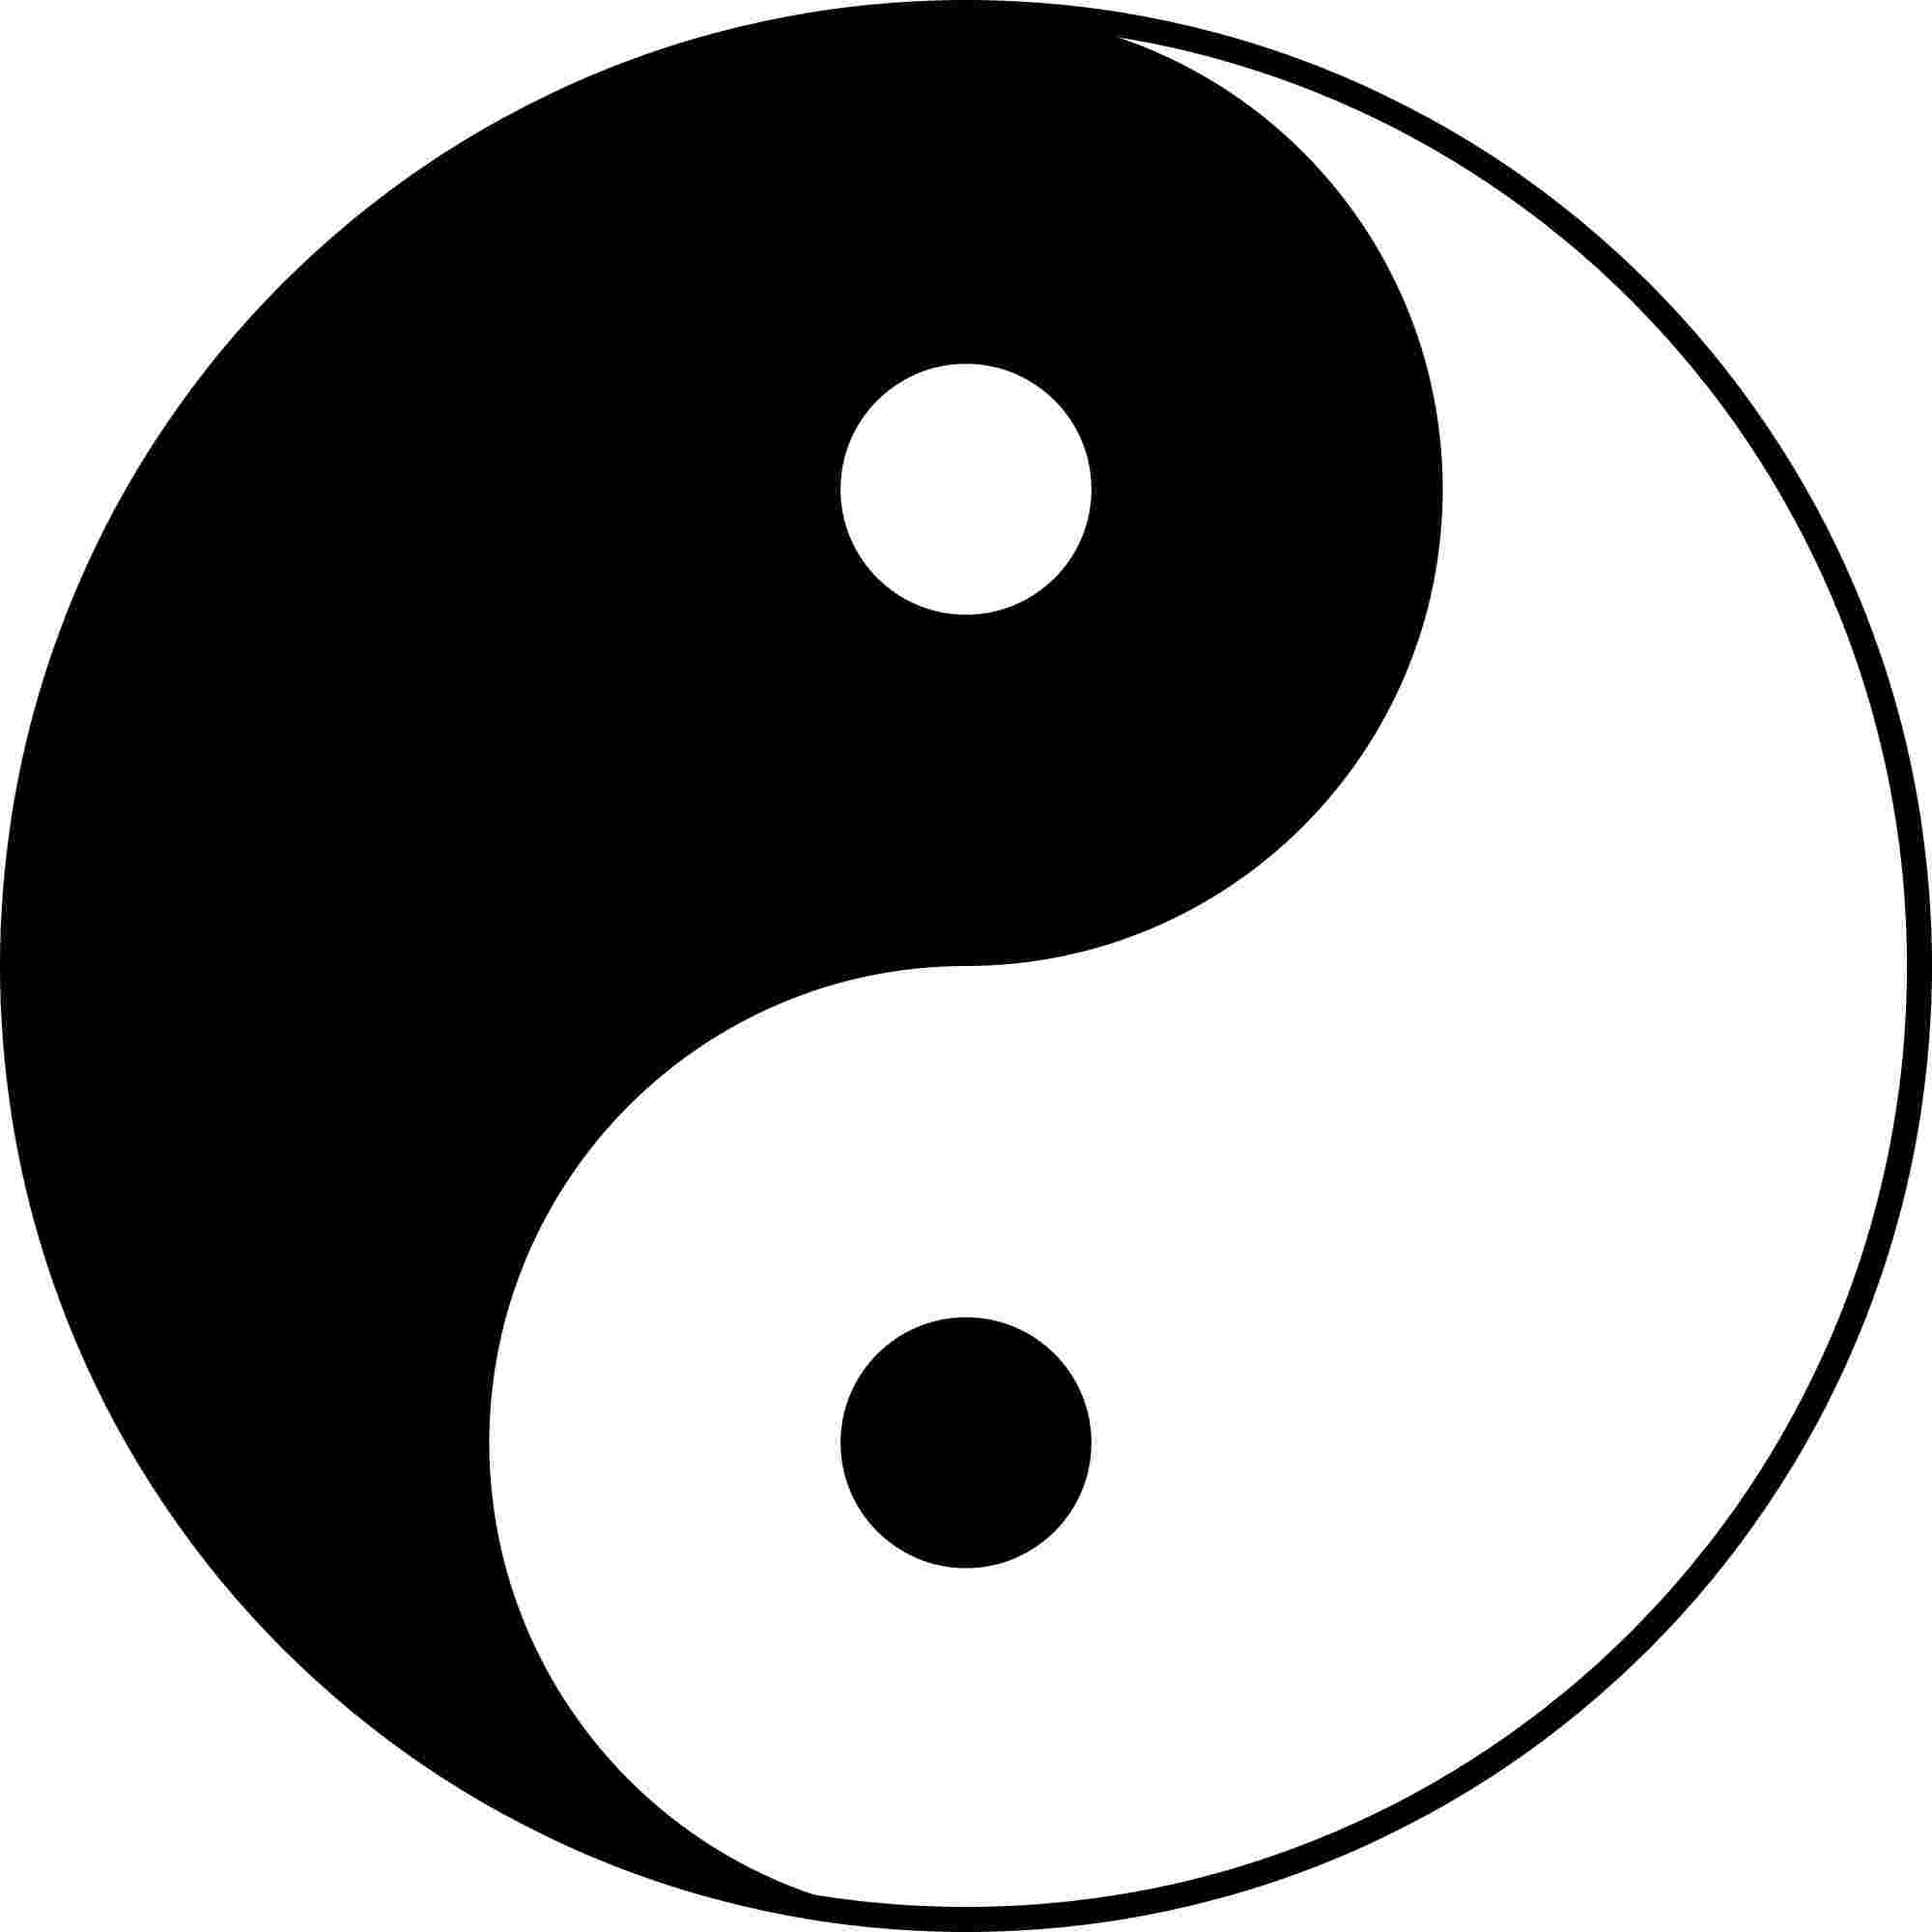 Best Cliparts: Free Yin Yang Symbol Clipart Free Yin Yang.